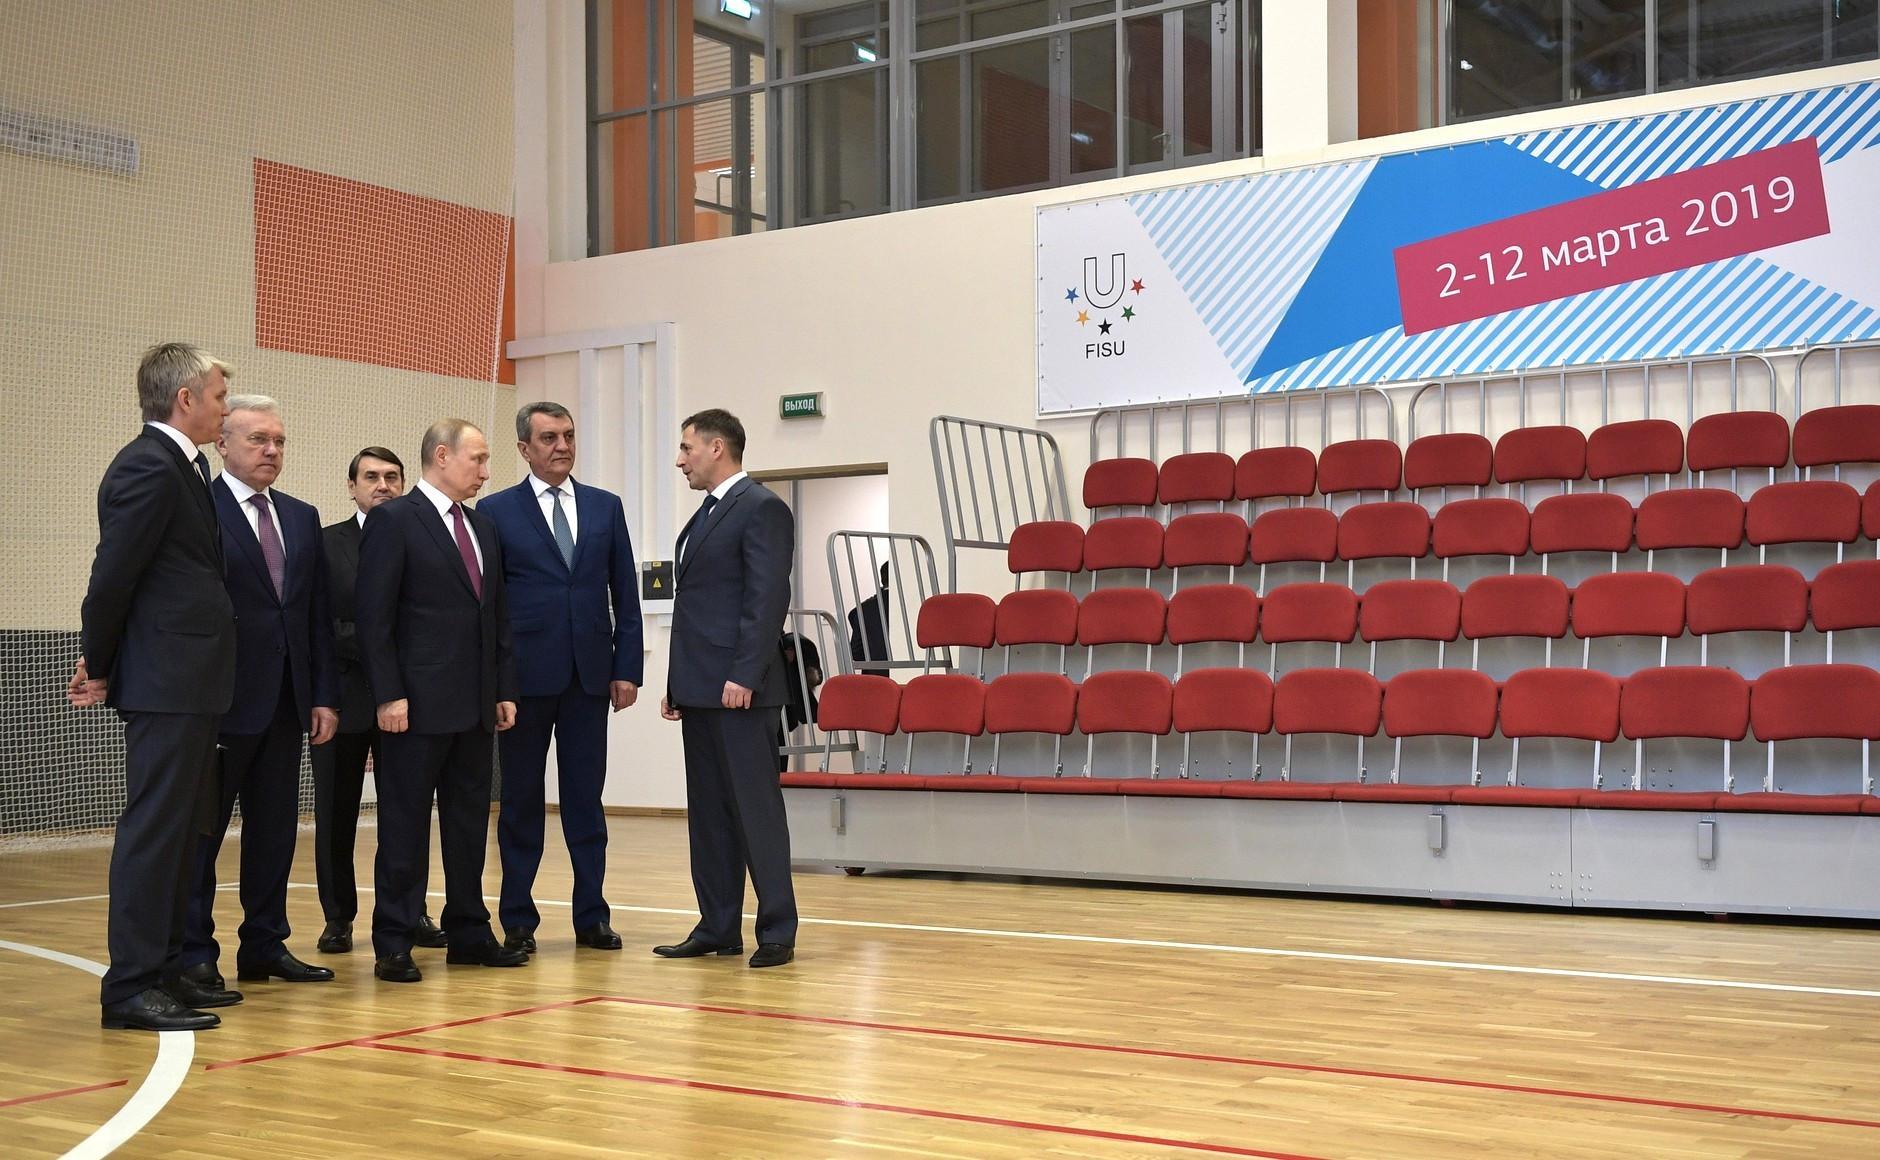 Vladimir Putin visited several Krasnoyarsk 2019 venues ©Kremlin.ru